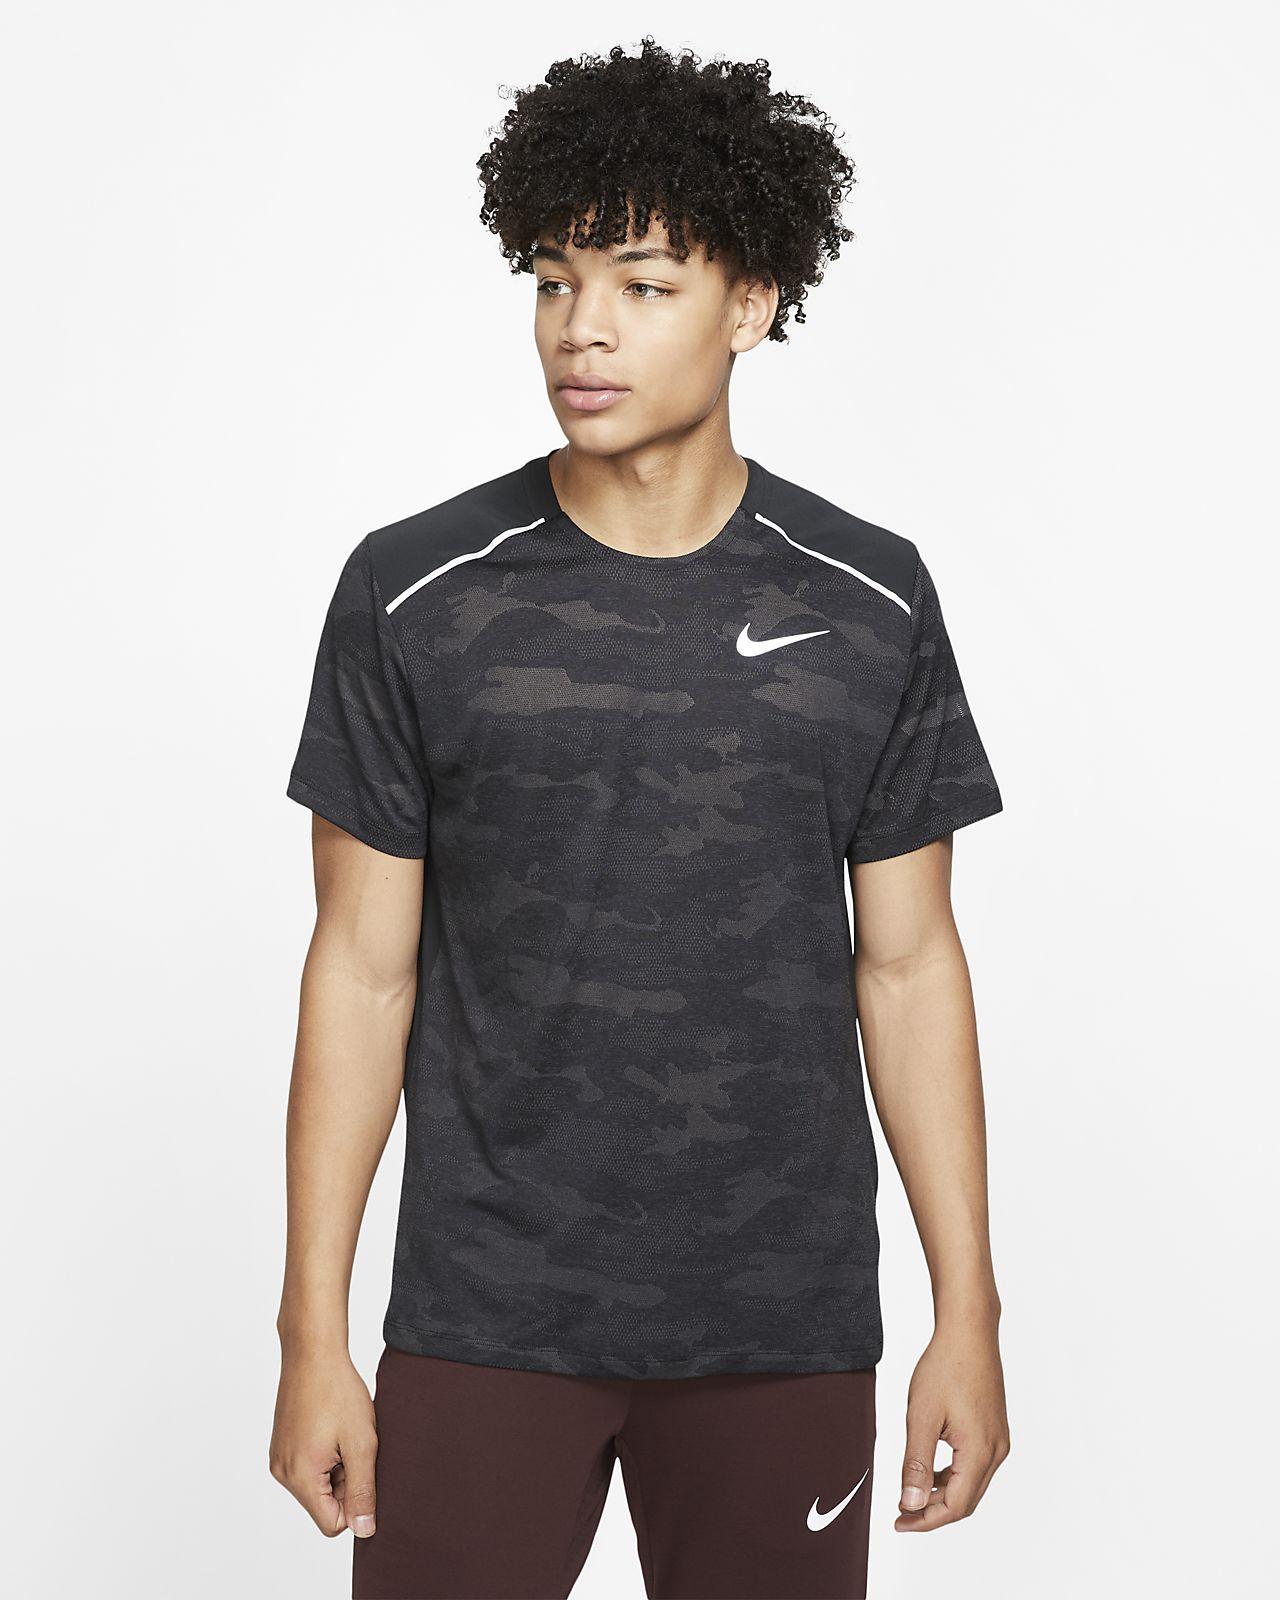 Camisola de running de manga curta Nike TechKnit para homem